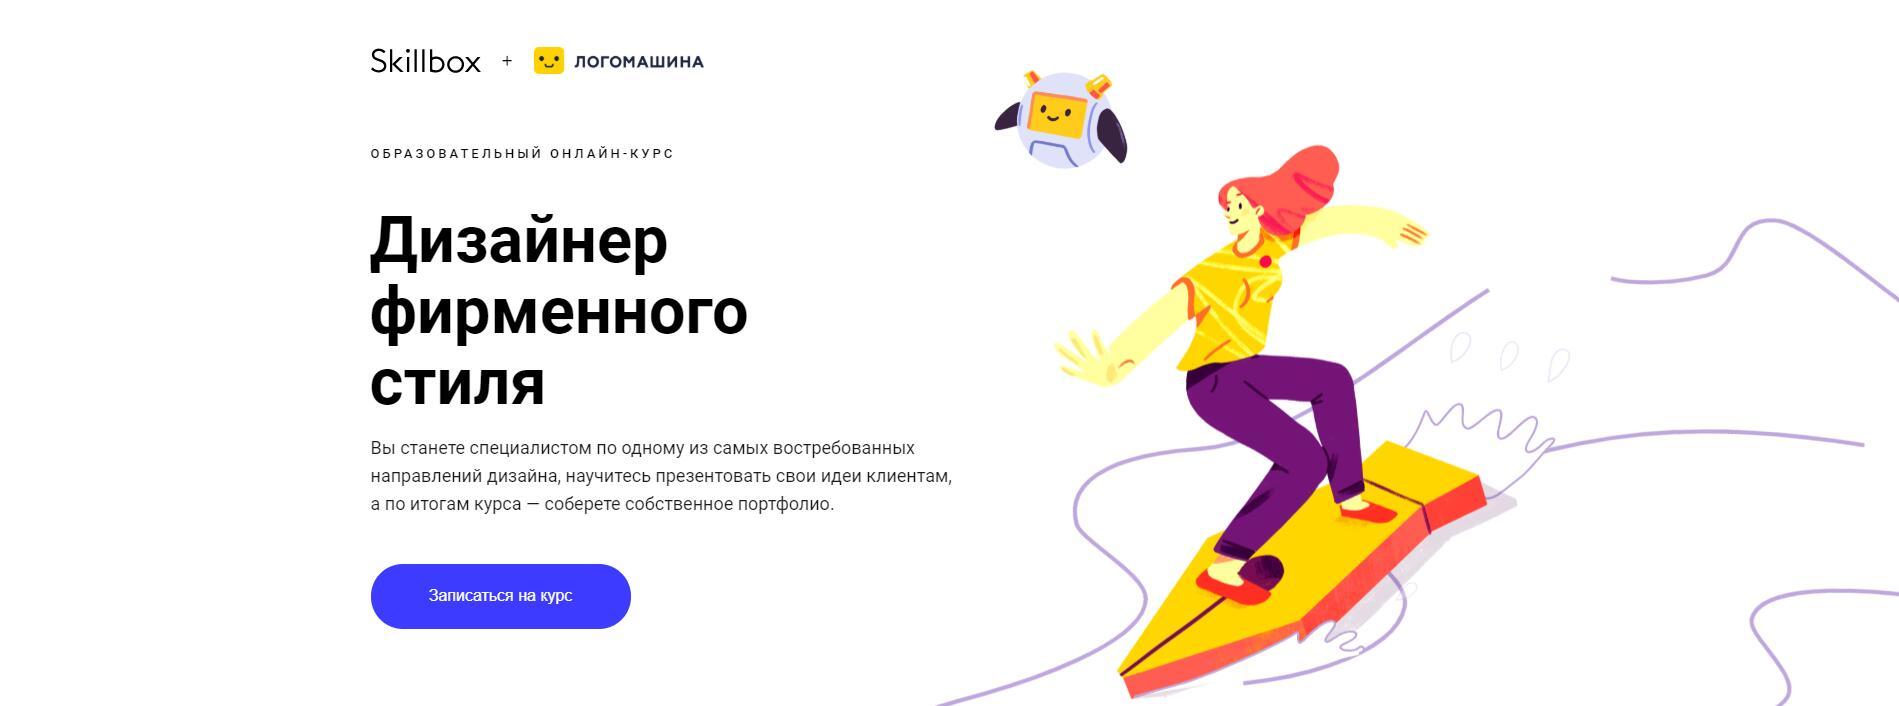 Курс «Дизайнер логотипа и фирменного стиля» от Skillbox.